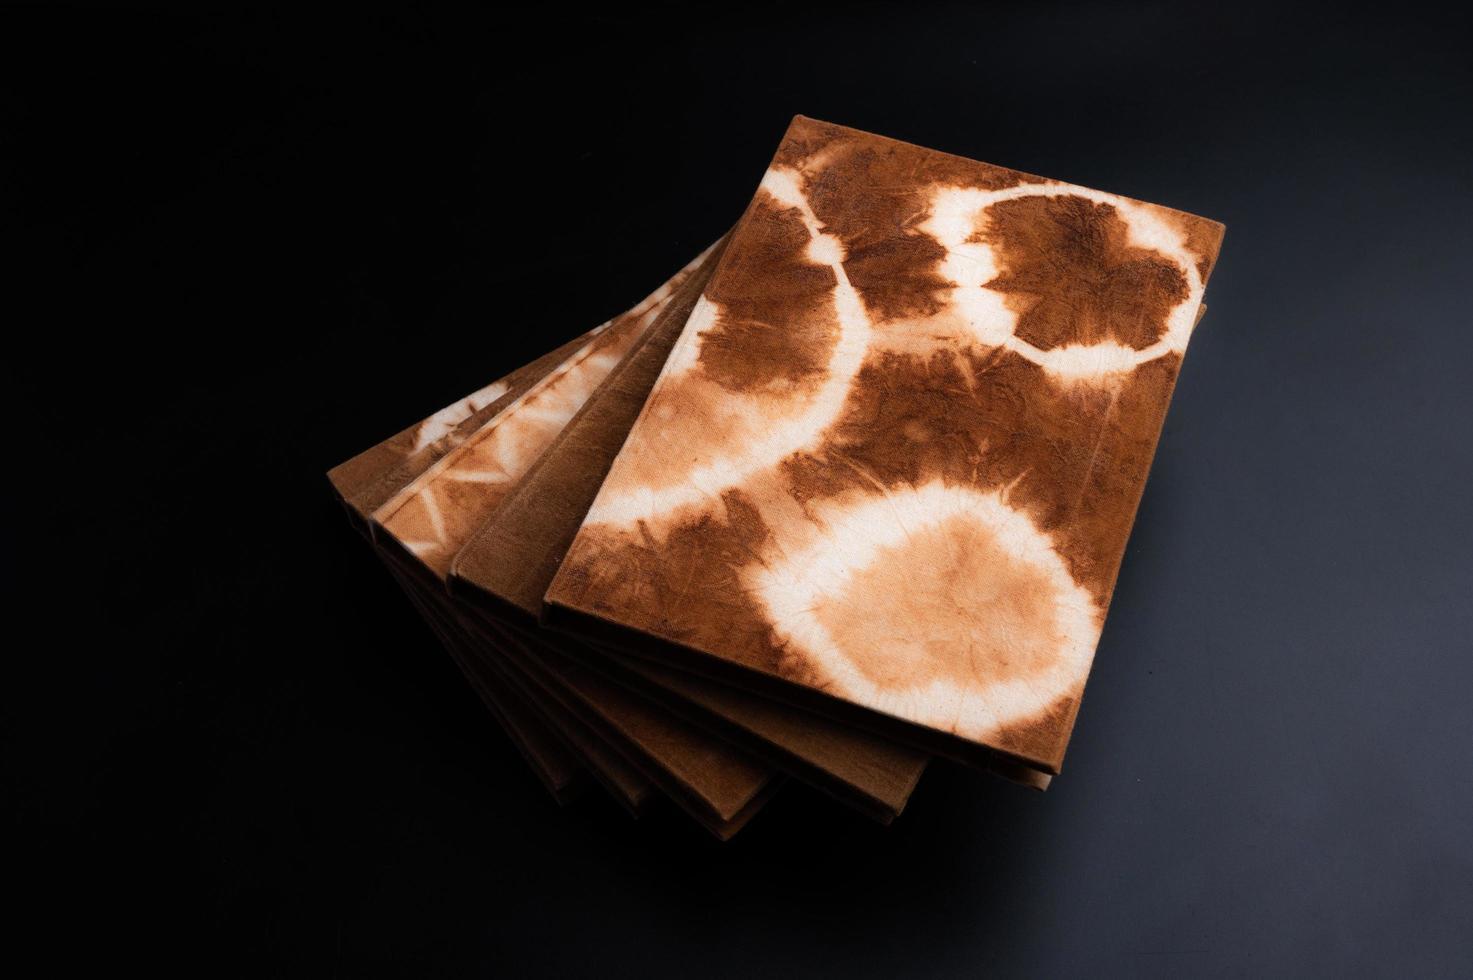 Handmade natural dyed notebooks photo